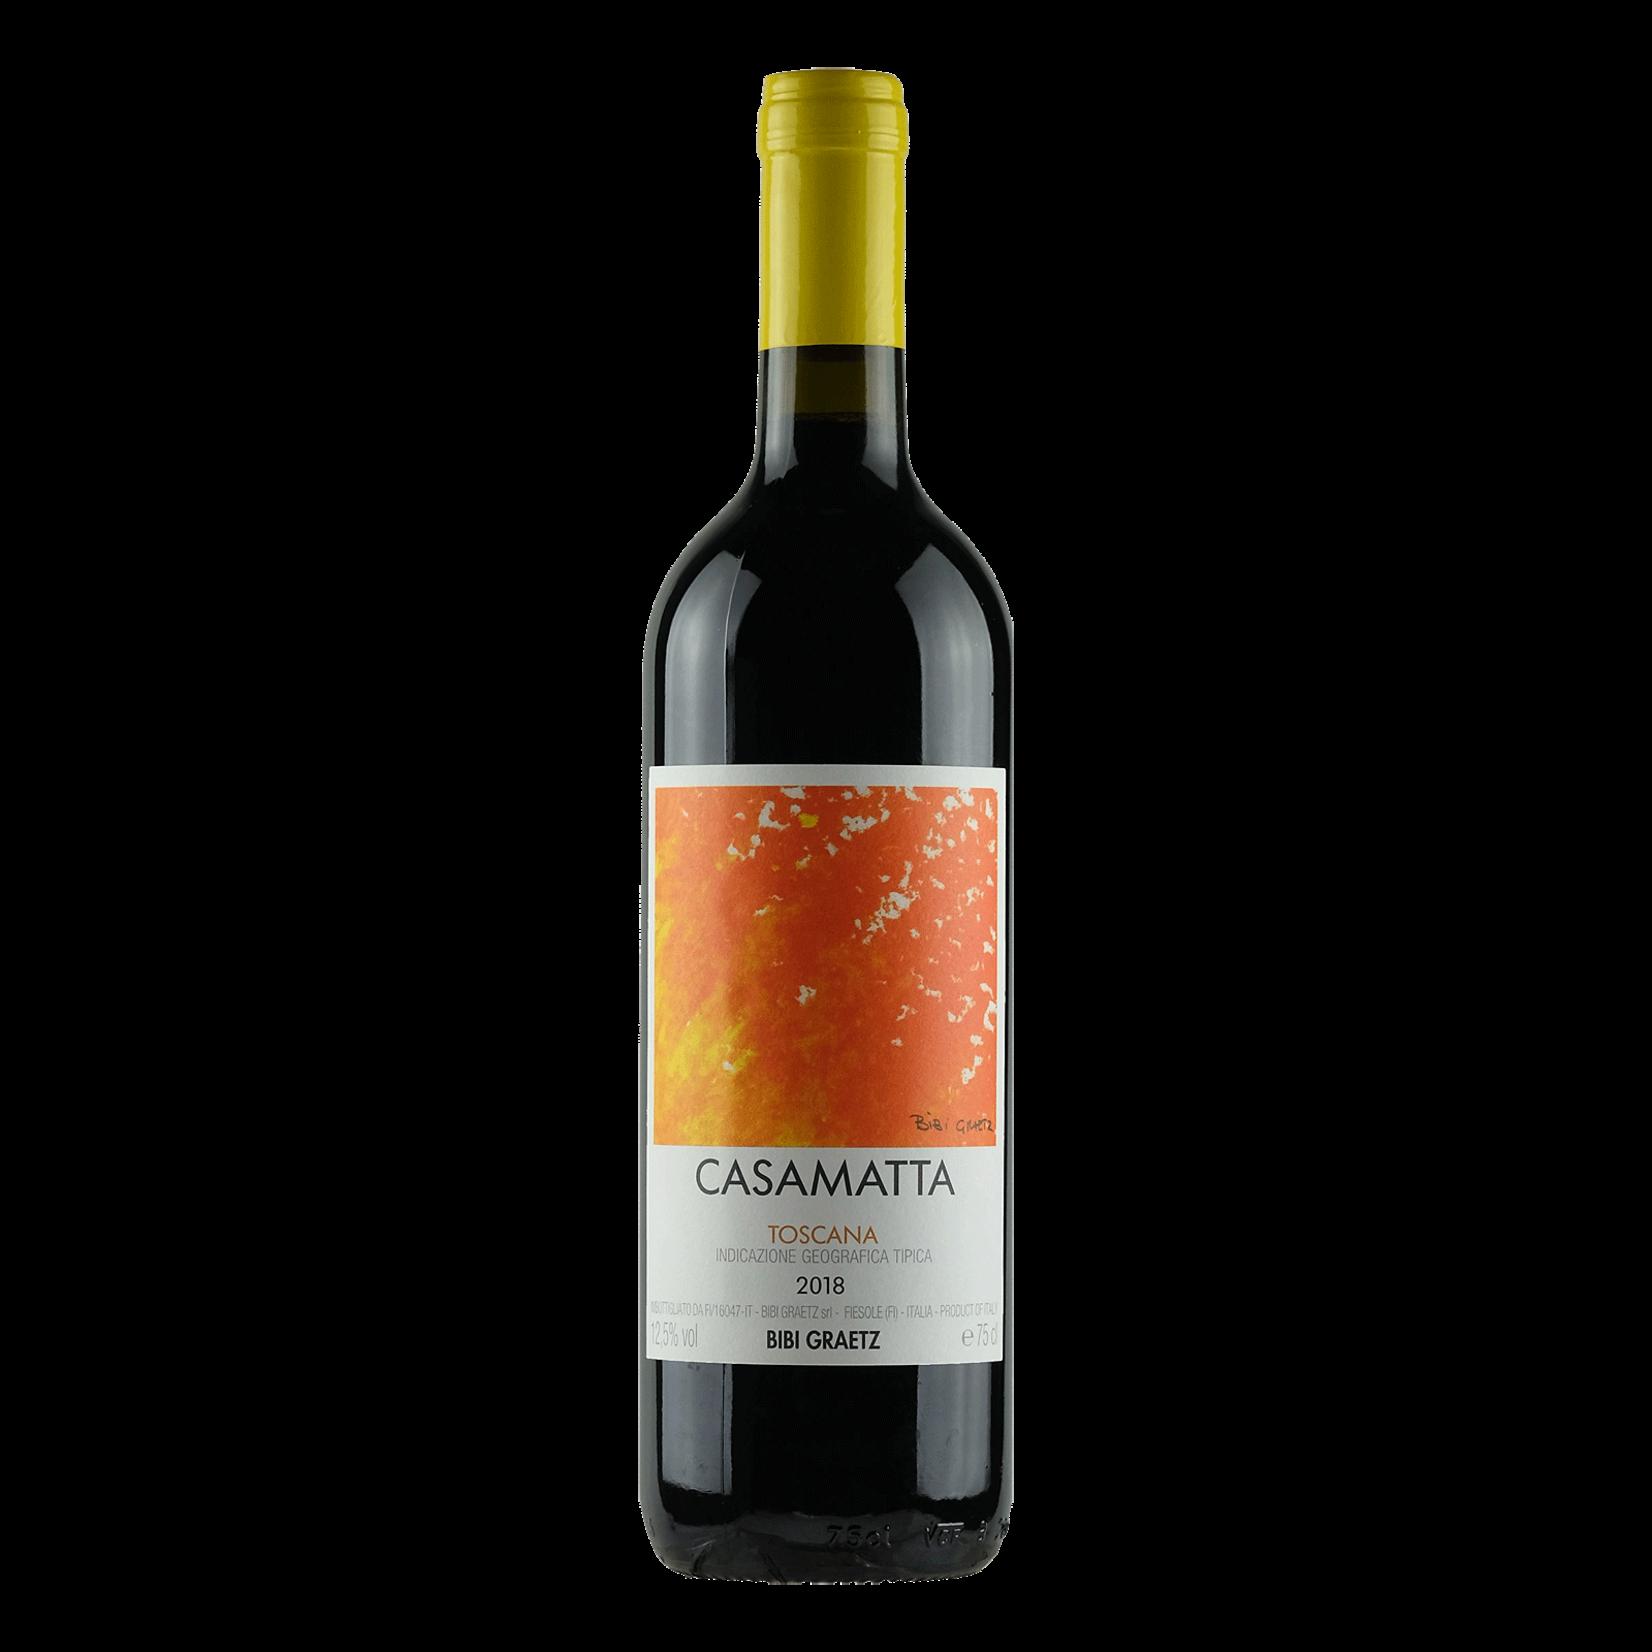 Wine Bibi Graetz Toscana Casamatta Sangiovese 2018